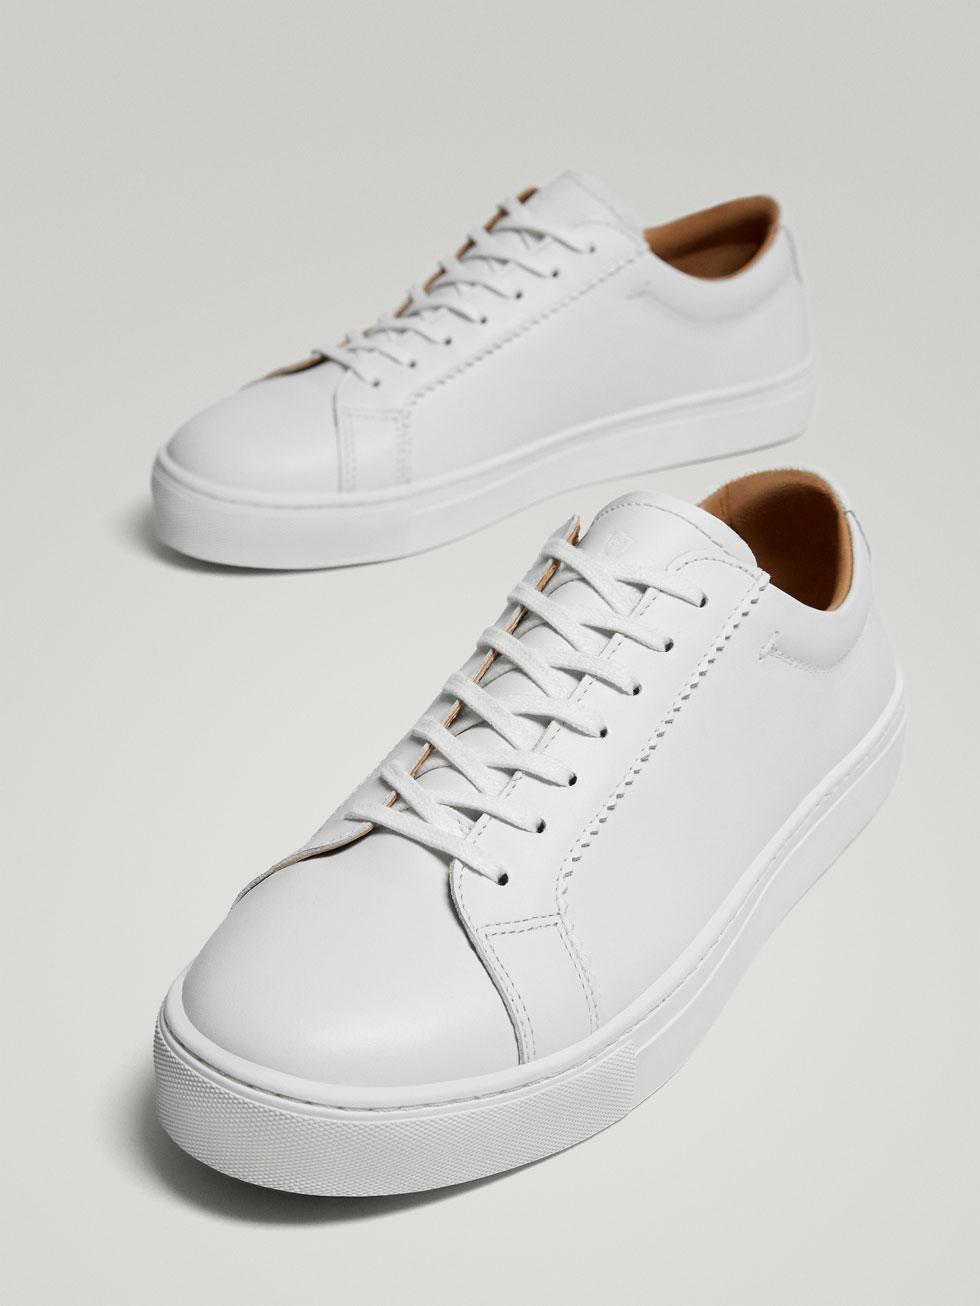 Chaussures De Sport En Cuir Blanc J26wBzi